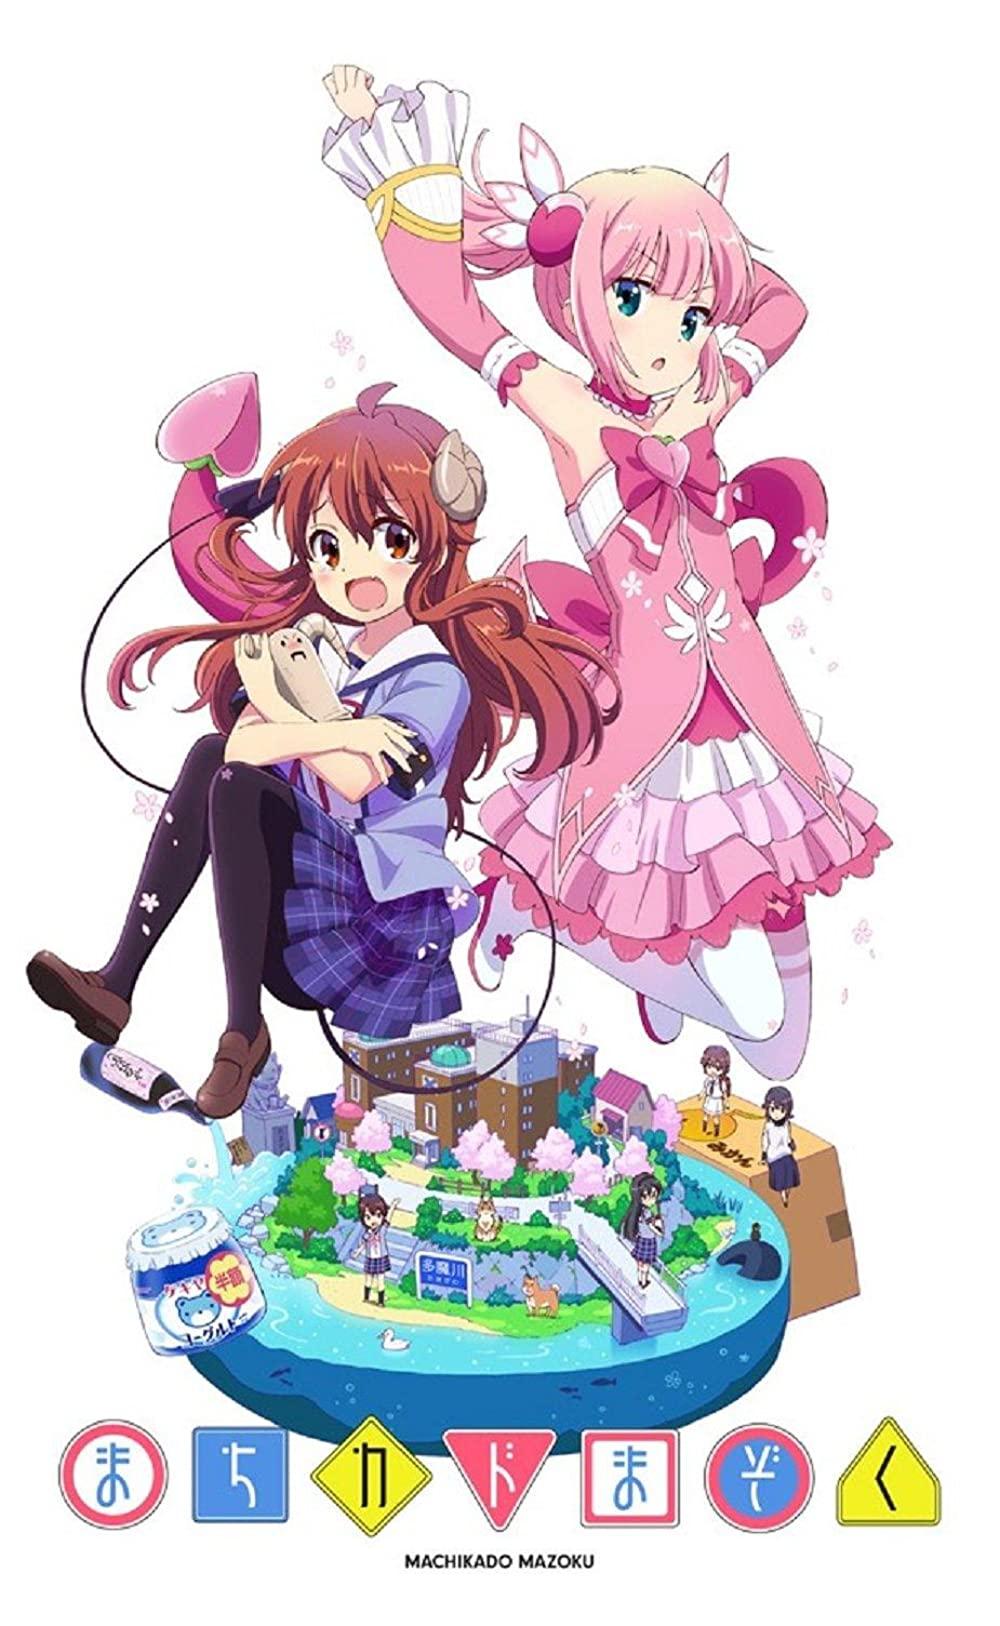 TVアニメ「まちカドまぞく」キービジュアル